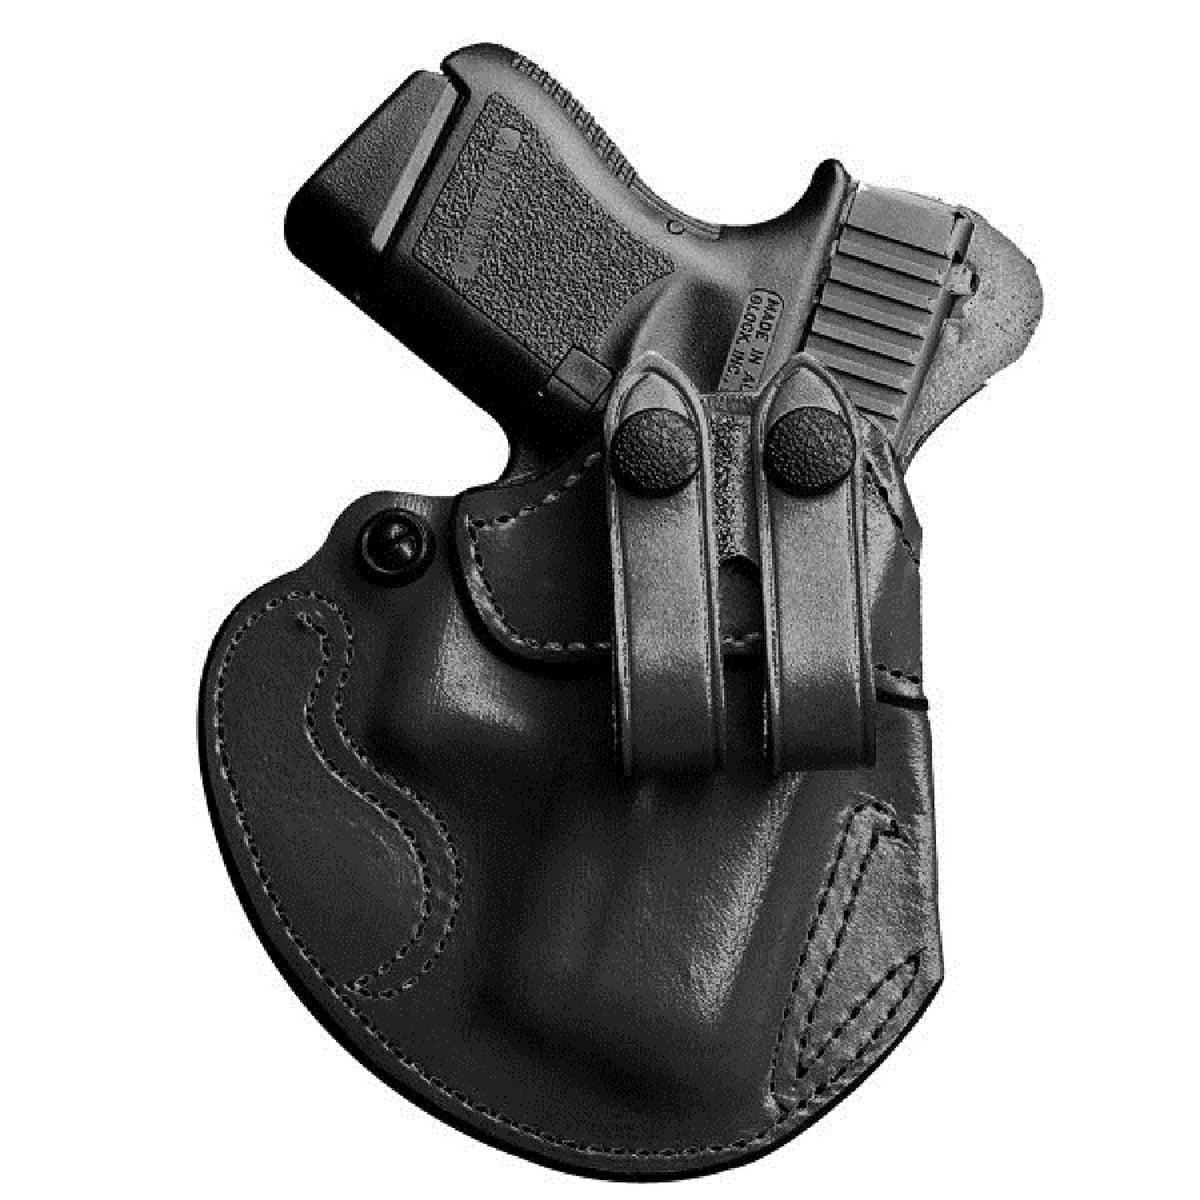 Desantis Cozy Partner IWB Black Glock 43 Holster by Desantis